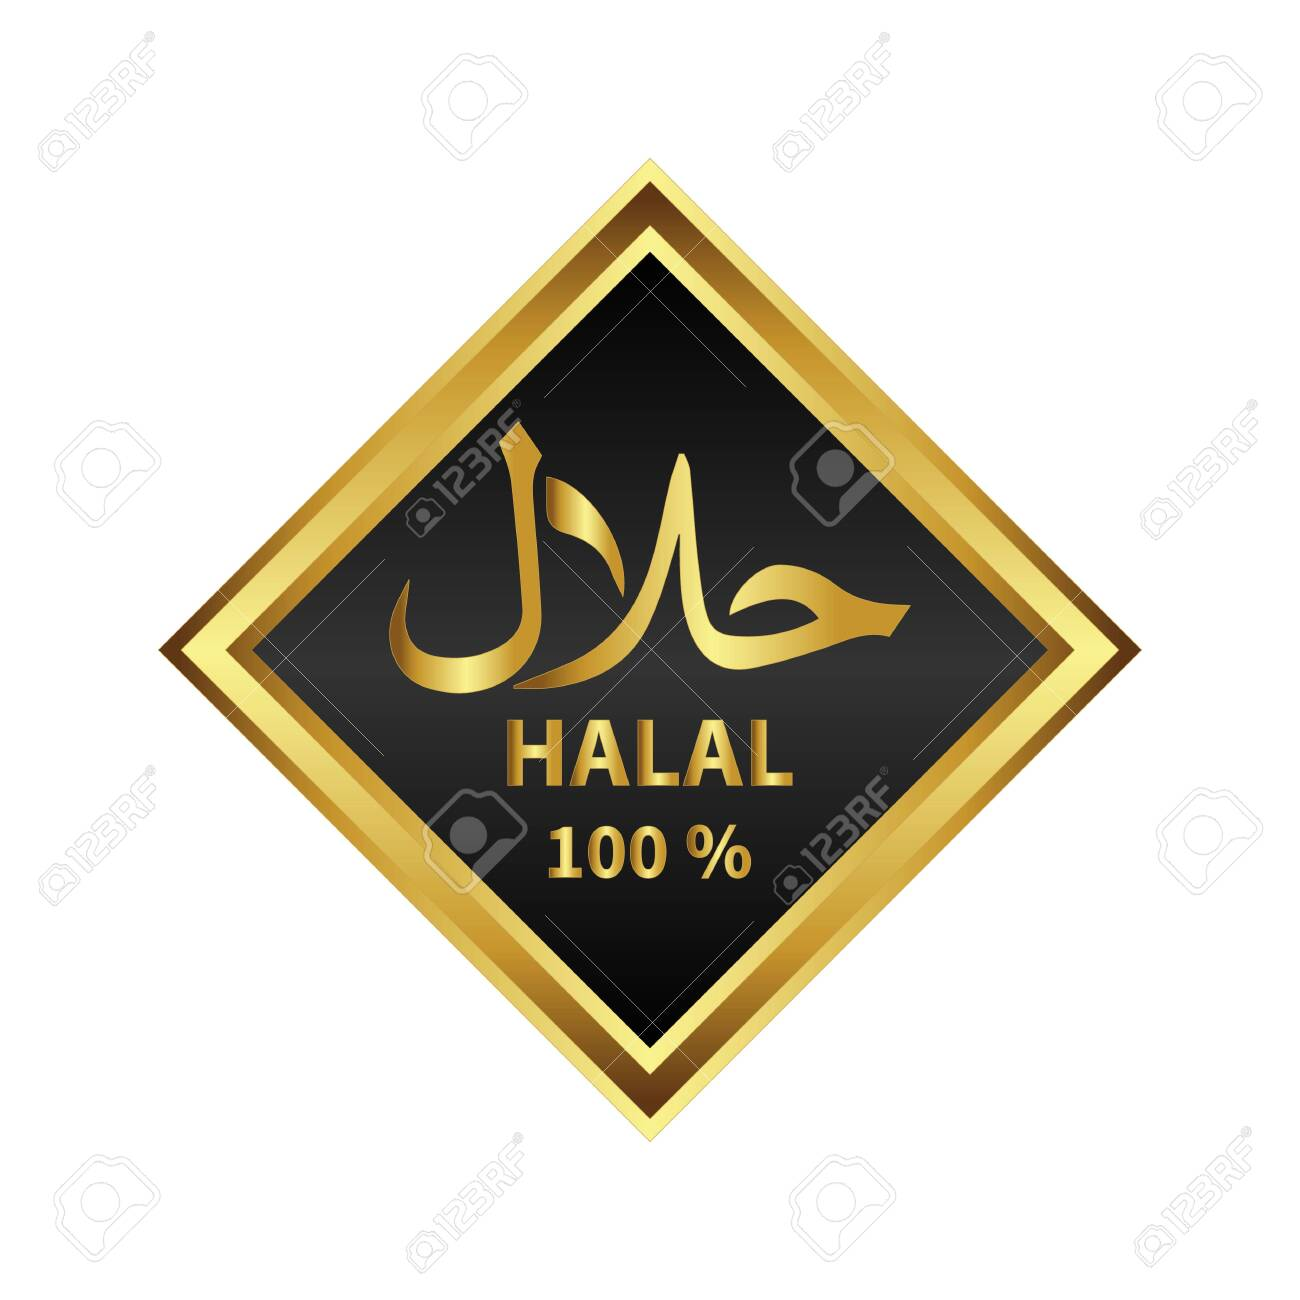 Halal Food Emblem Halal Logo Vector Illustration Certificate Royalty Free Cliparts Vectors And Stock Illustration Image 143576775